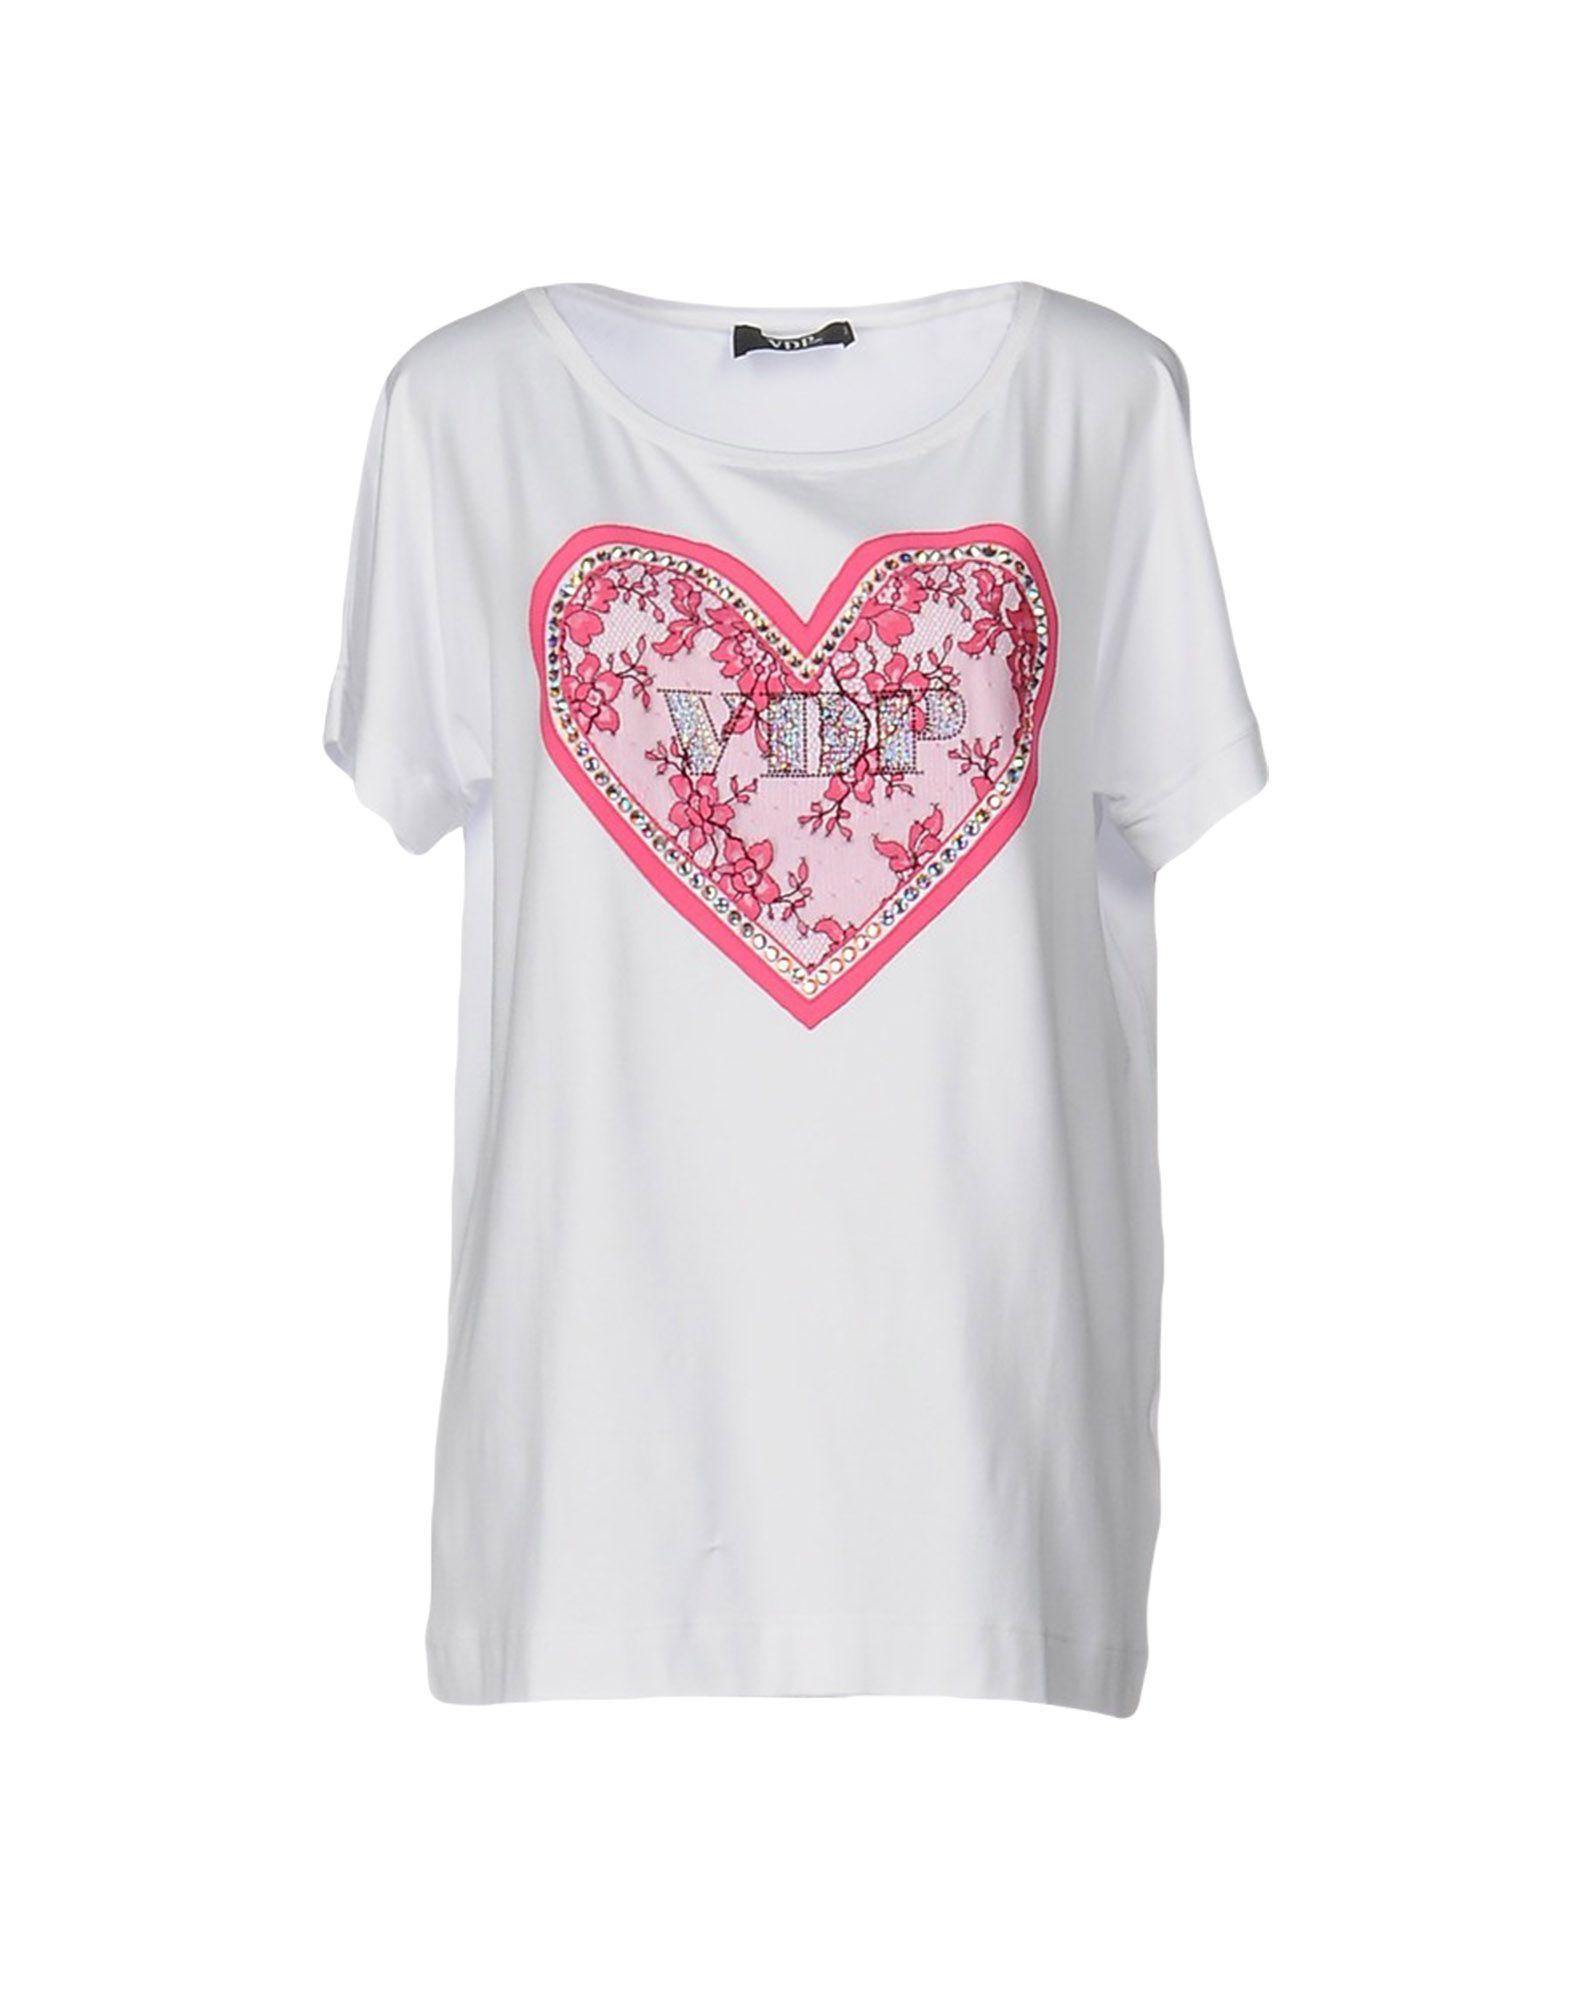 T-Shirt Vdp Collection Donna - Acquista online su